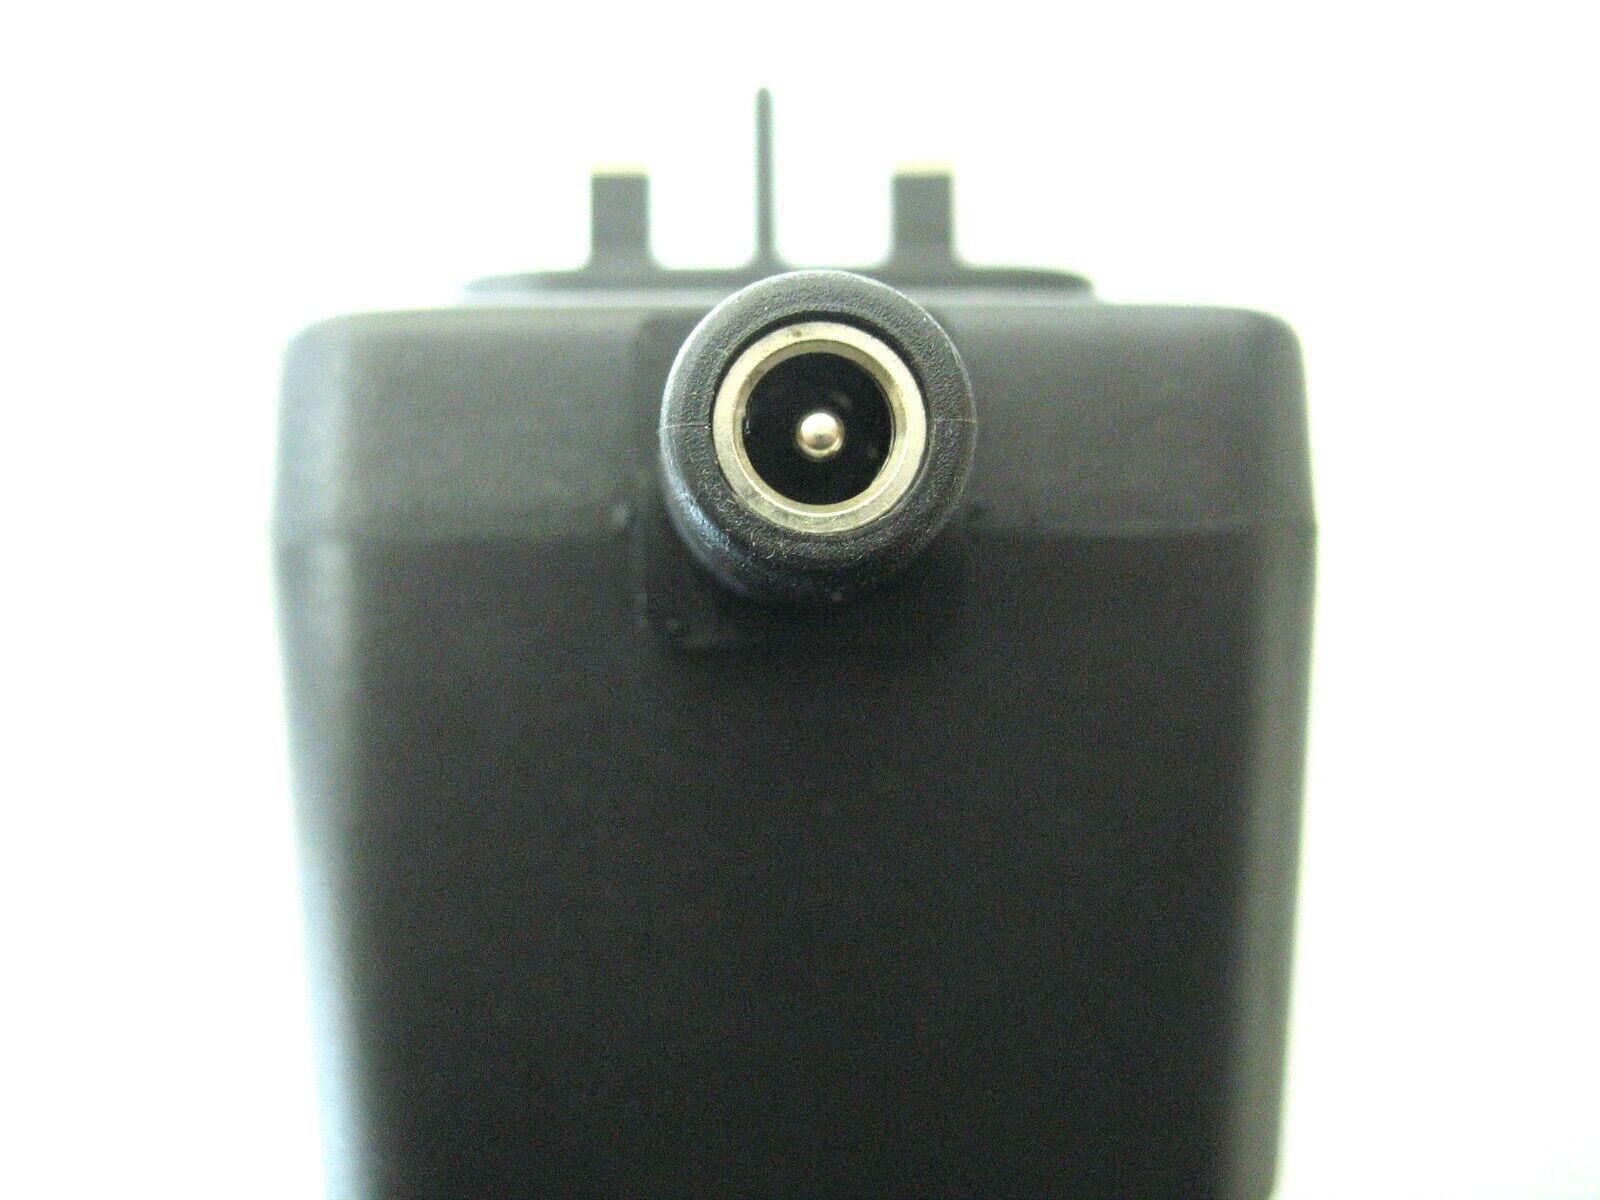 0.5 amp 24 volt Socket AC-DC (DC Output) Power Adaptor/Supply/Charger 12 watt